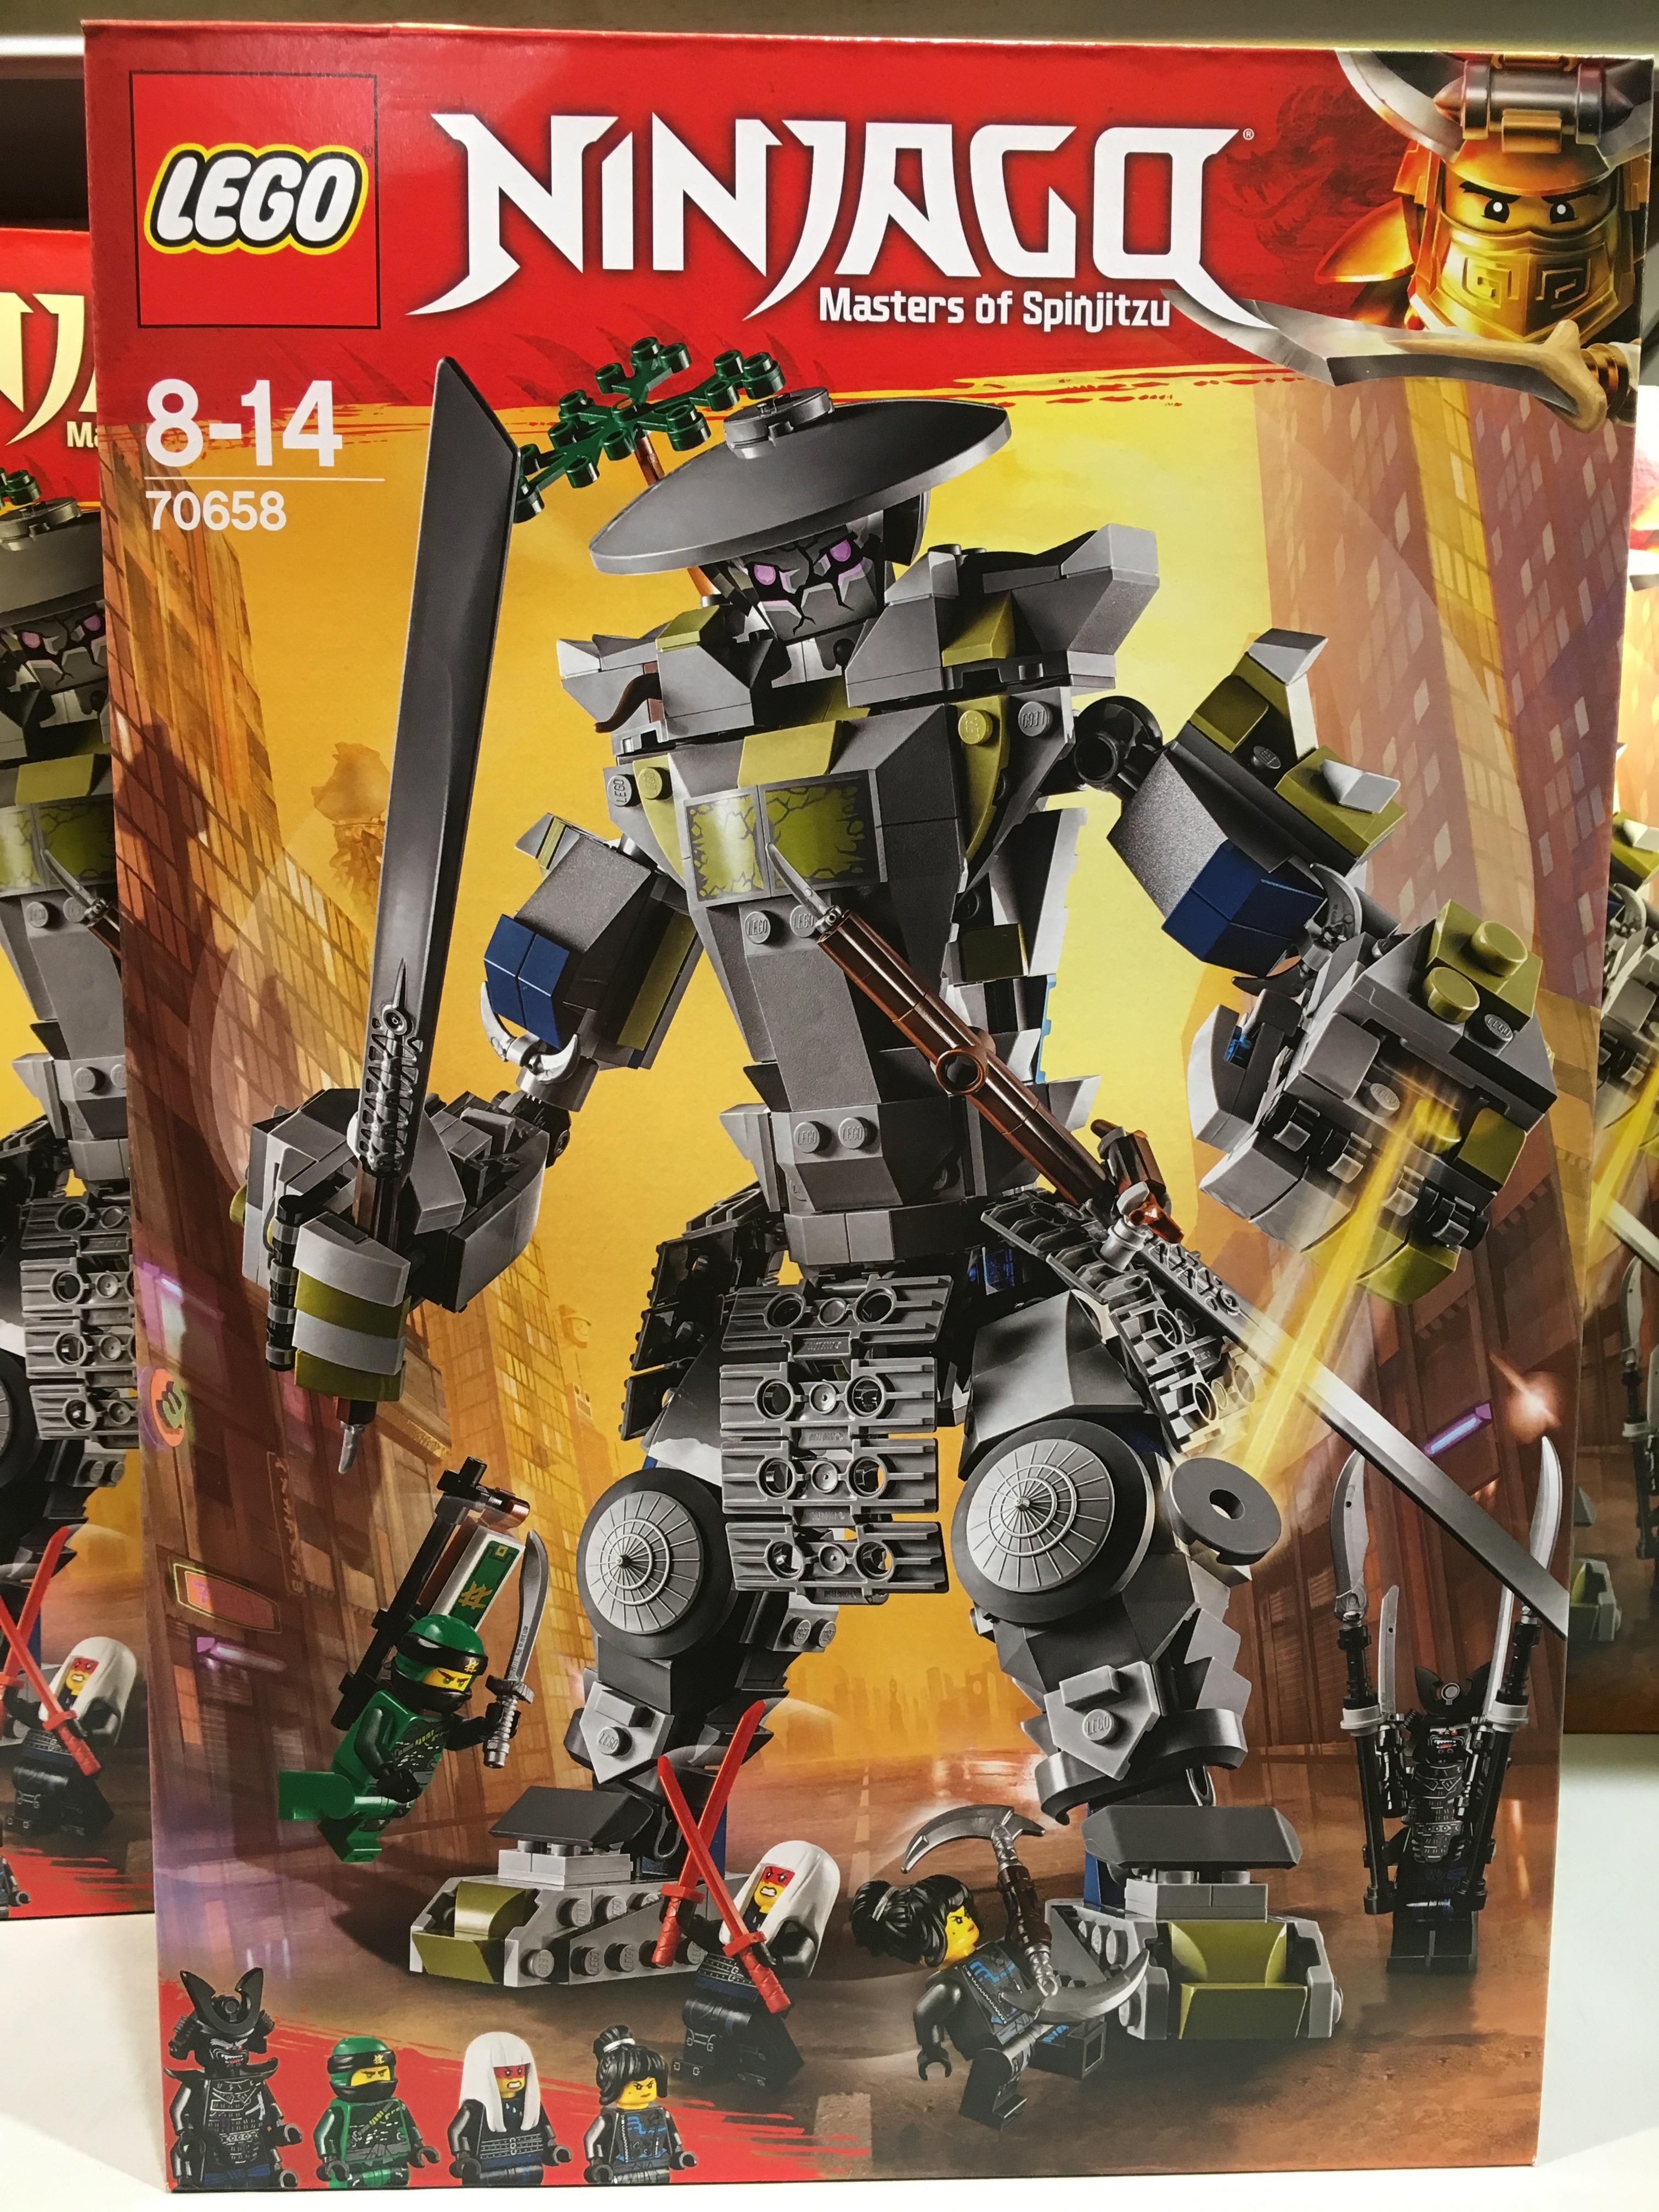 Lego Ninjago Oni Titan 70658 Set Found At Legoland Billund The